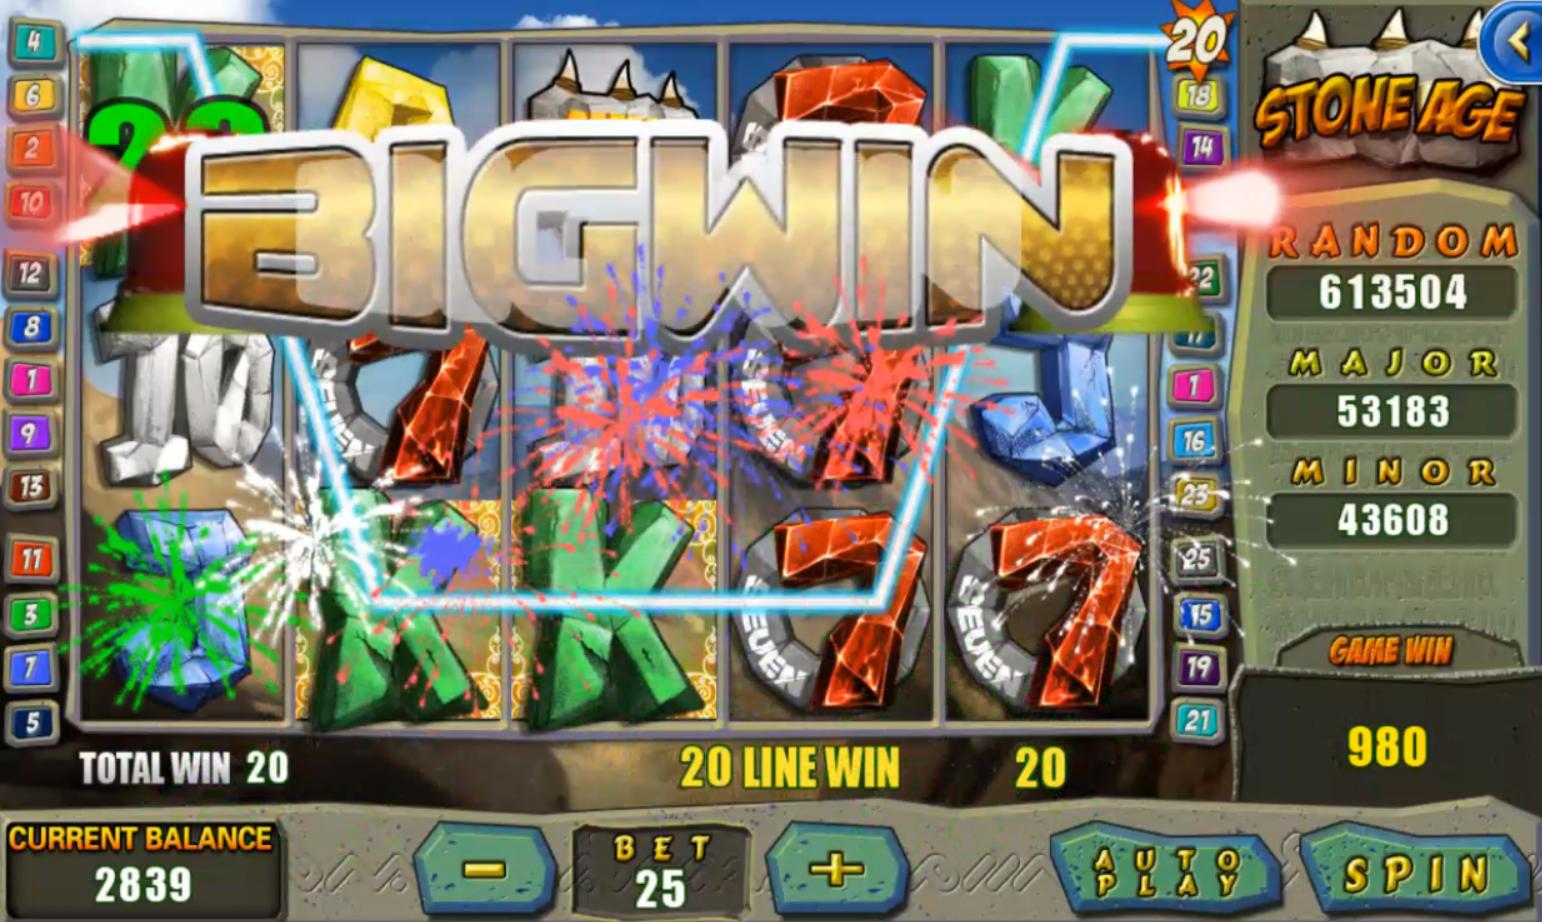 Stone Age Slot Game Ini Amat Menarik Sebab Wild Cardnya Hebat Apabila Dapat Wild Card Ia Memohon Kepada 1 Garis Ja Free Slot Games Online Casino Slots Games